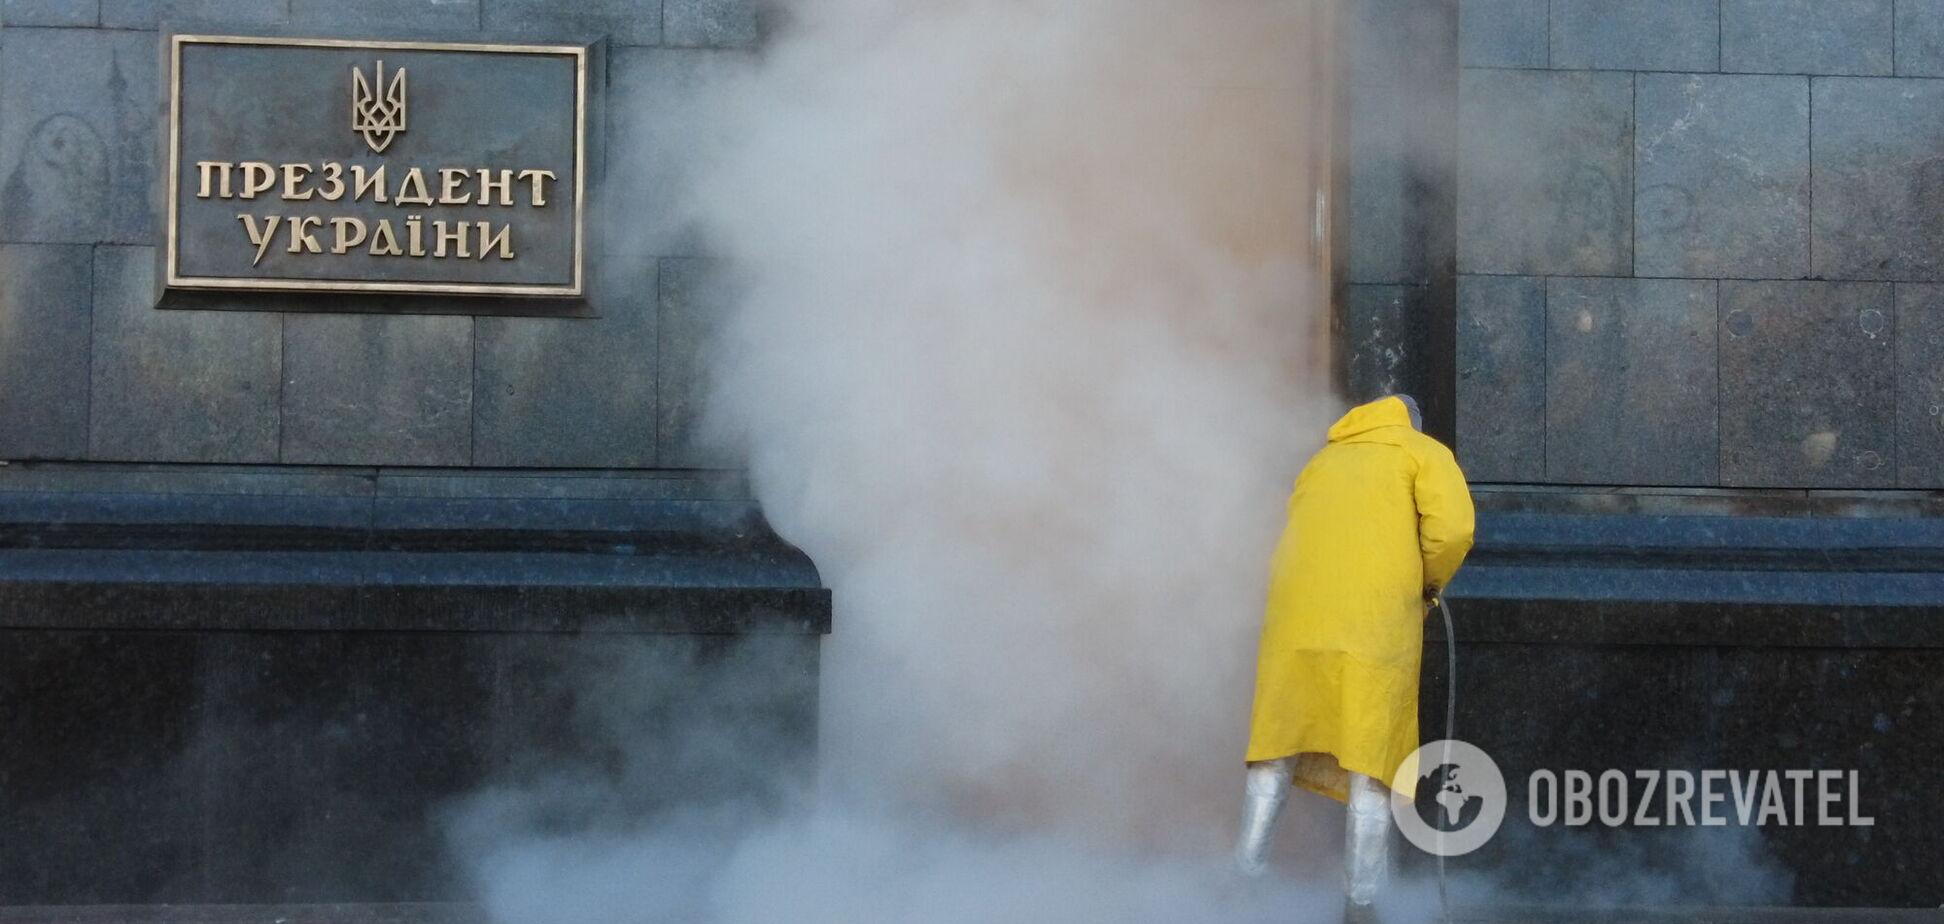 В Киеве полностью отмыли здание Офиса президента. Фото, видео